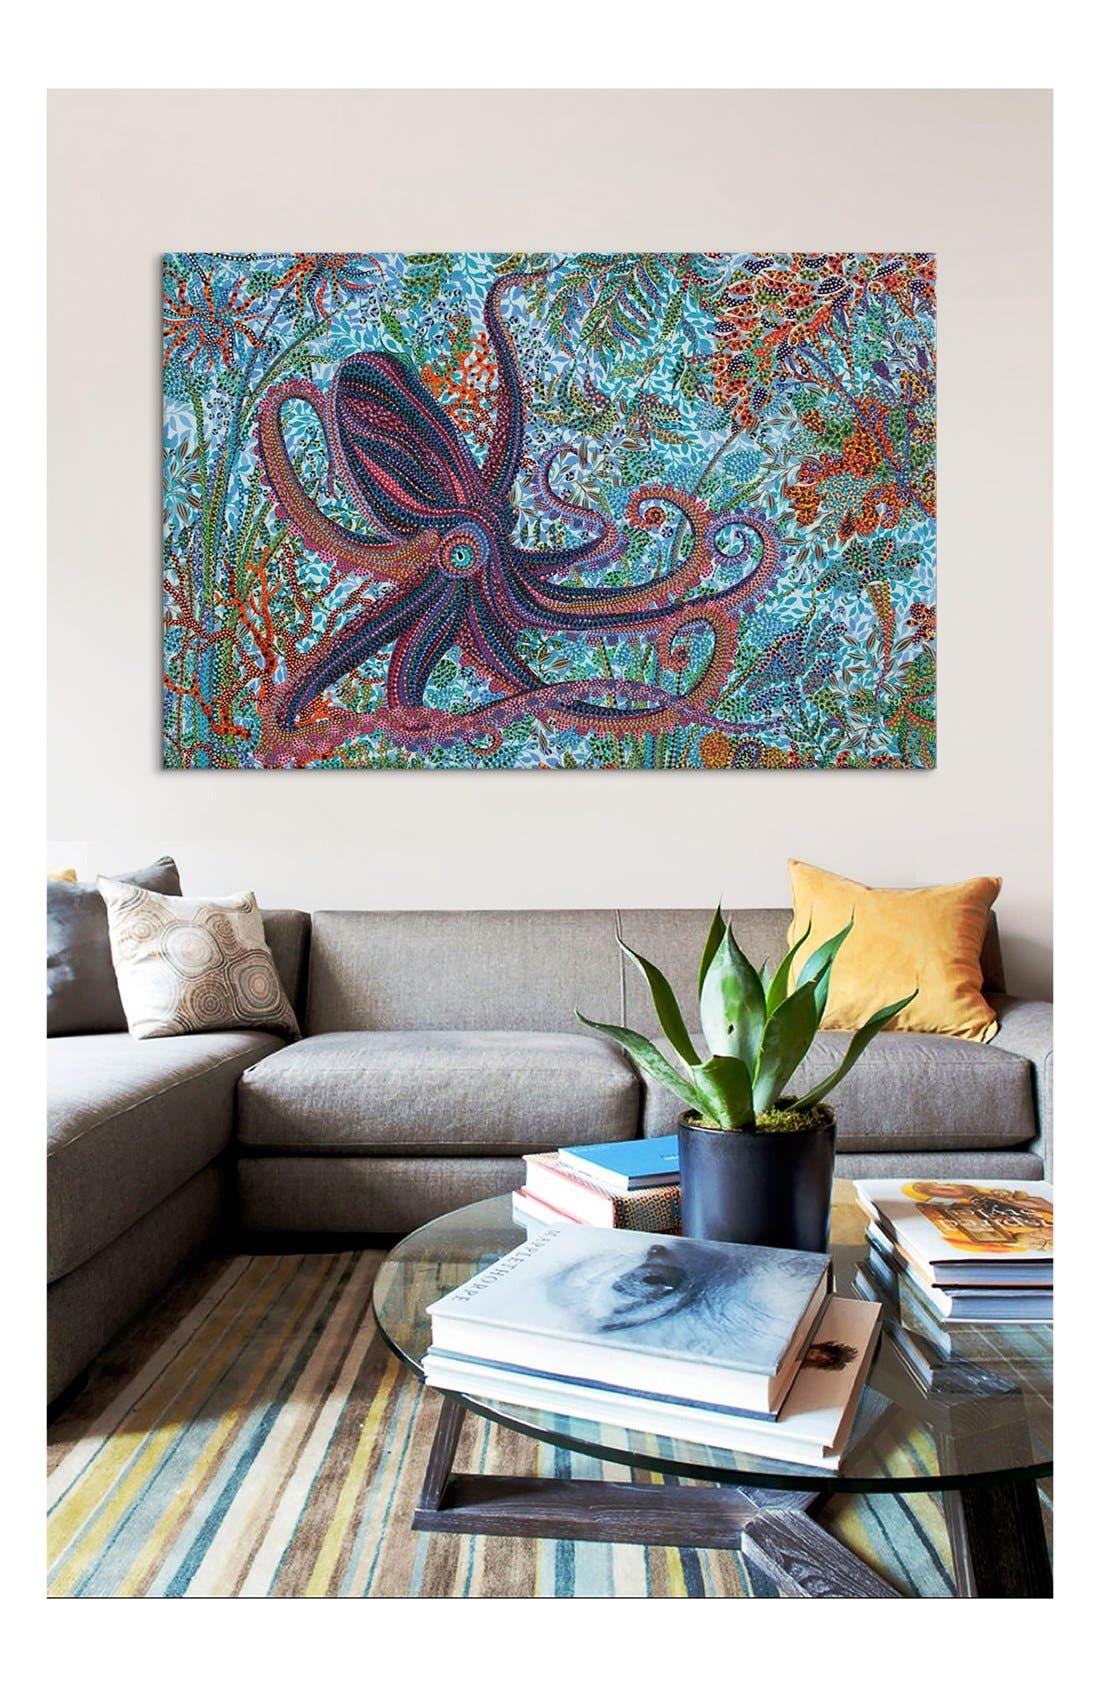 'Octopus - Ebova' Giclée Print Canvas Art,                             Alternate thumbnail 2, color,                             400